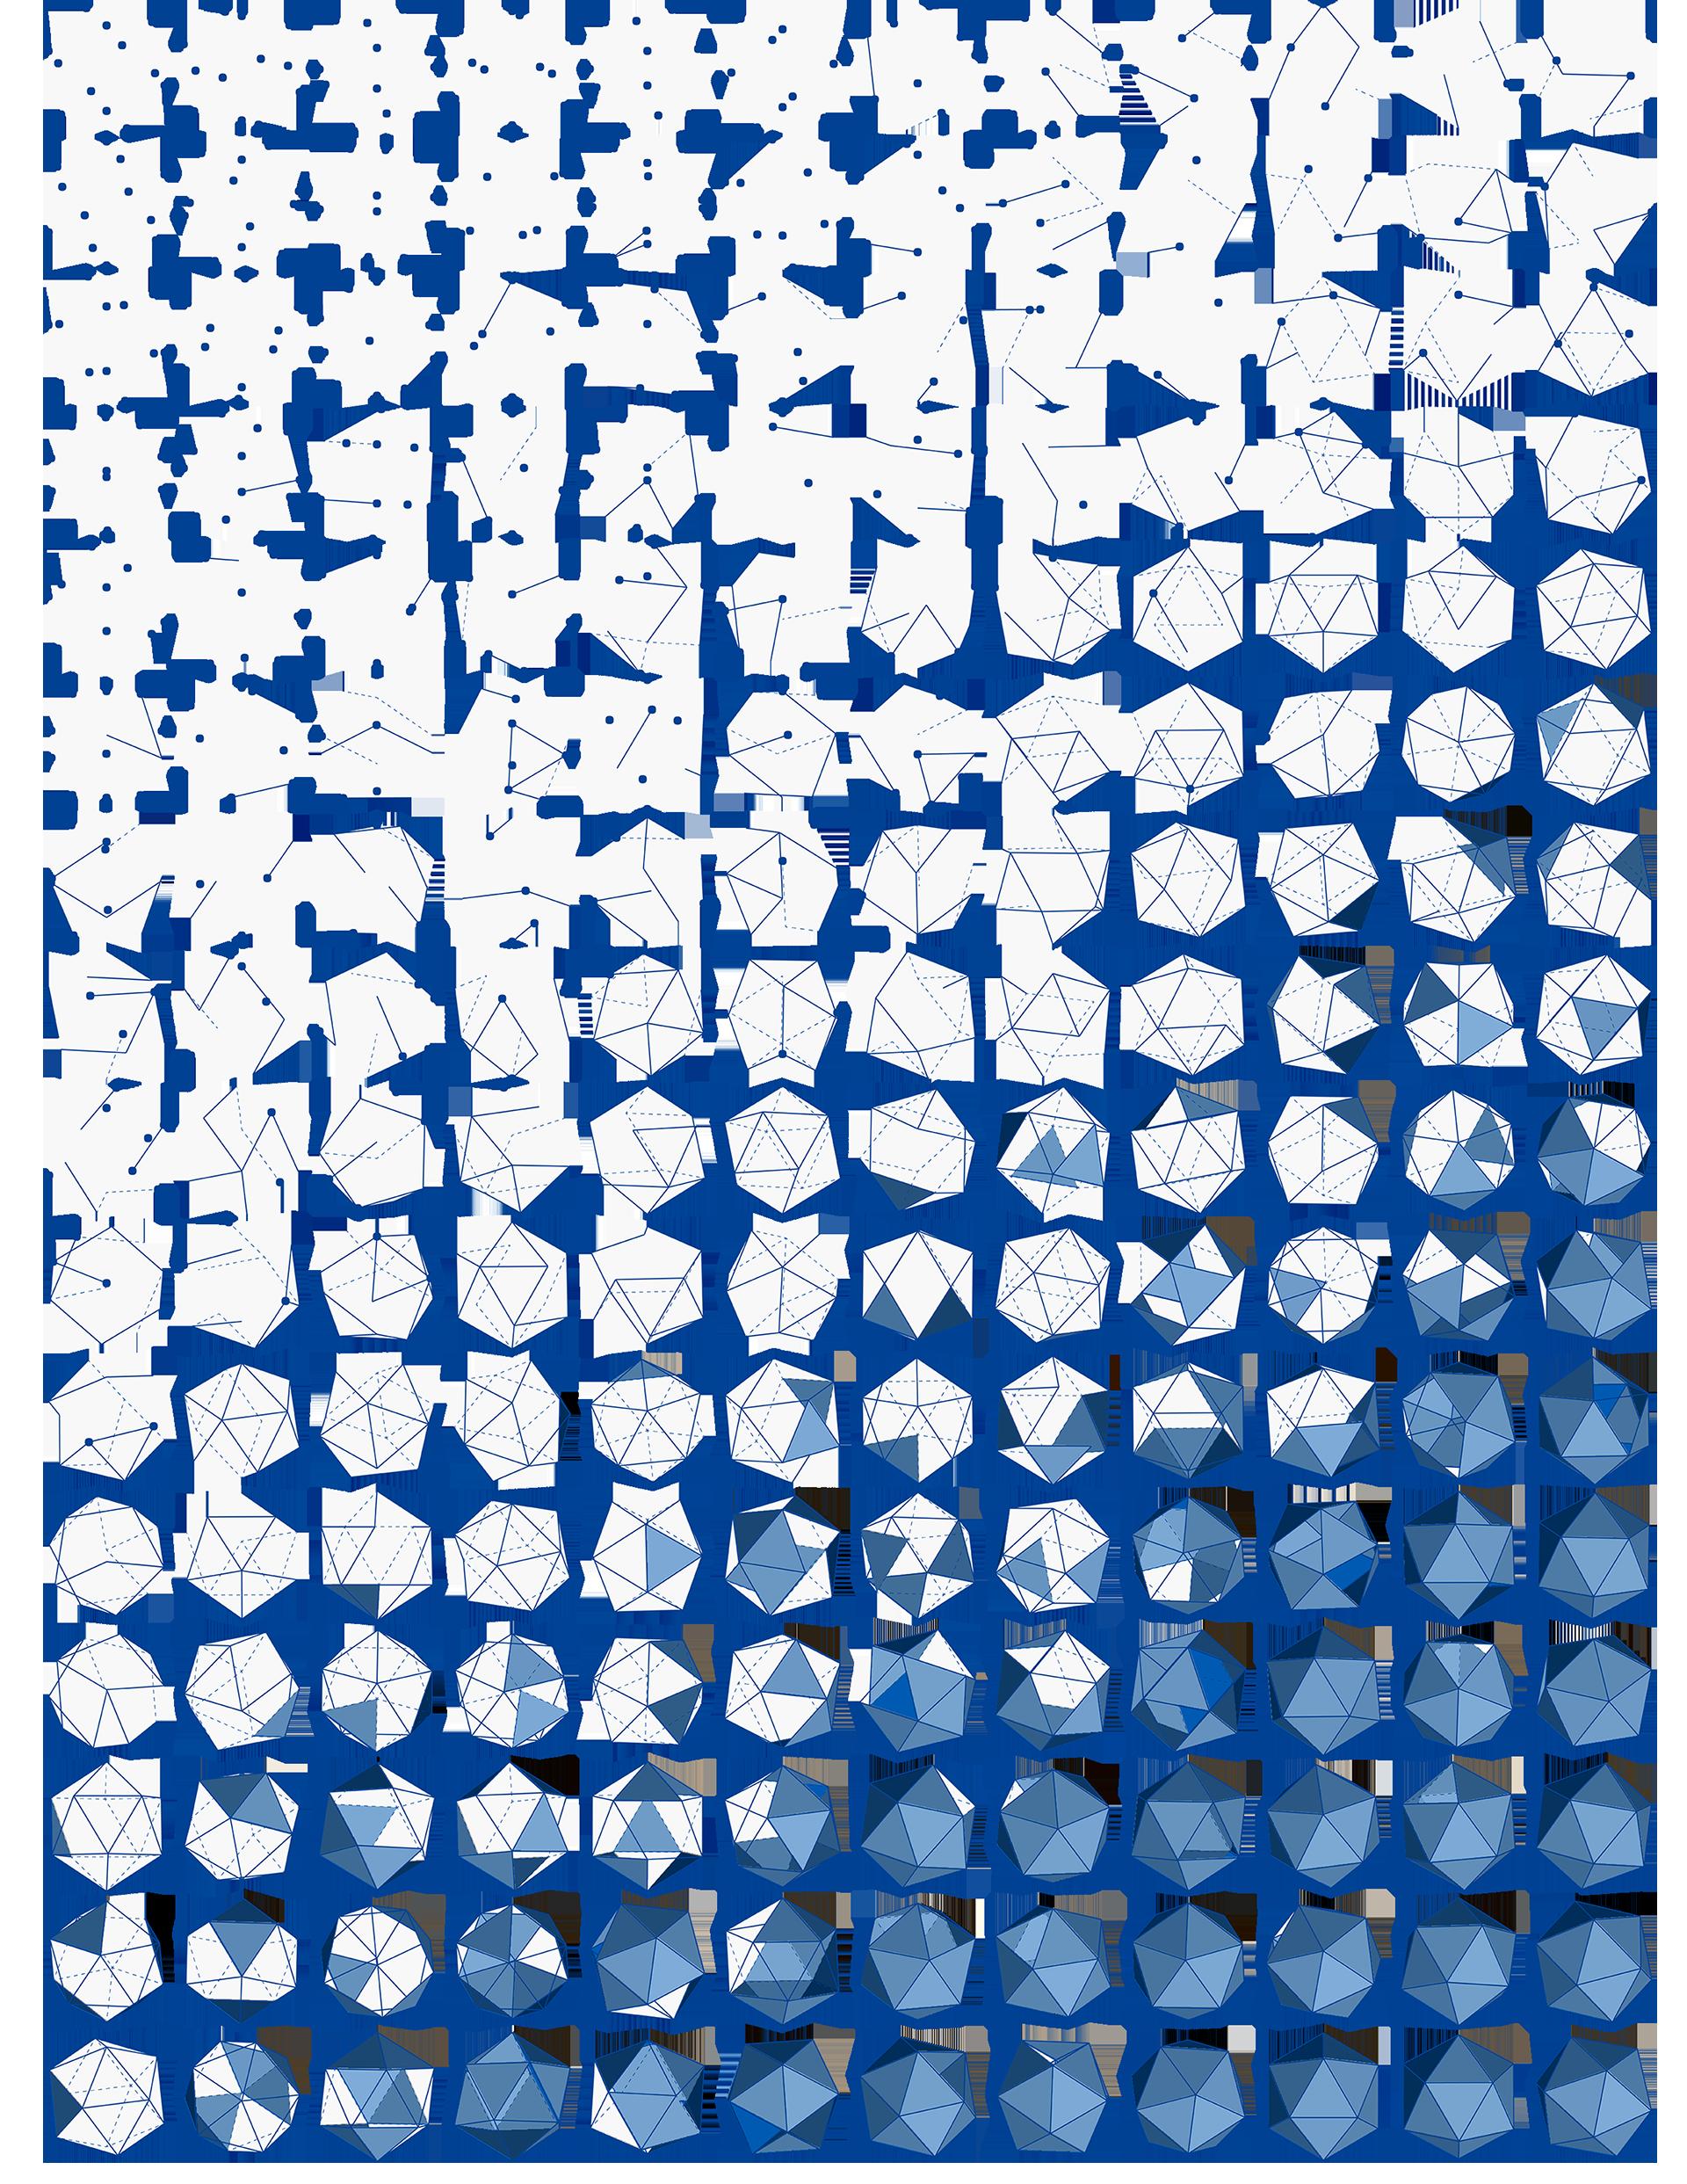 HQ Geometry Wallpapers | File 3307.63Kb